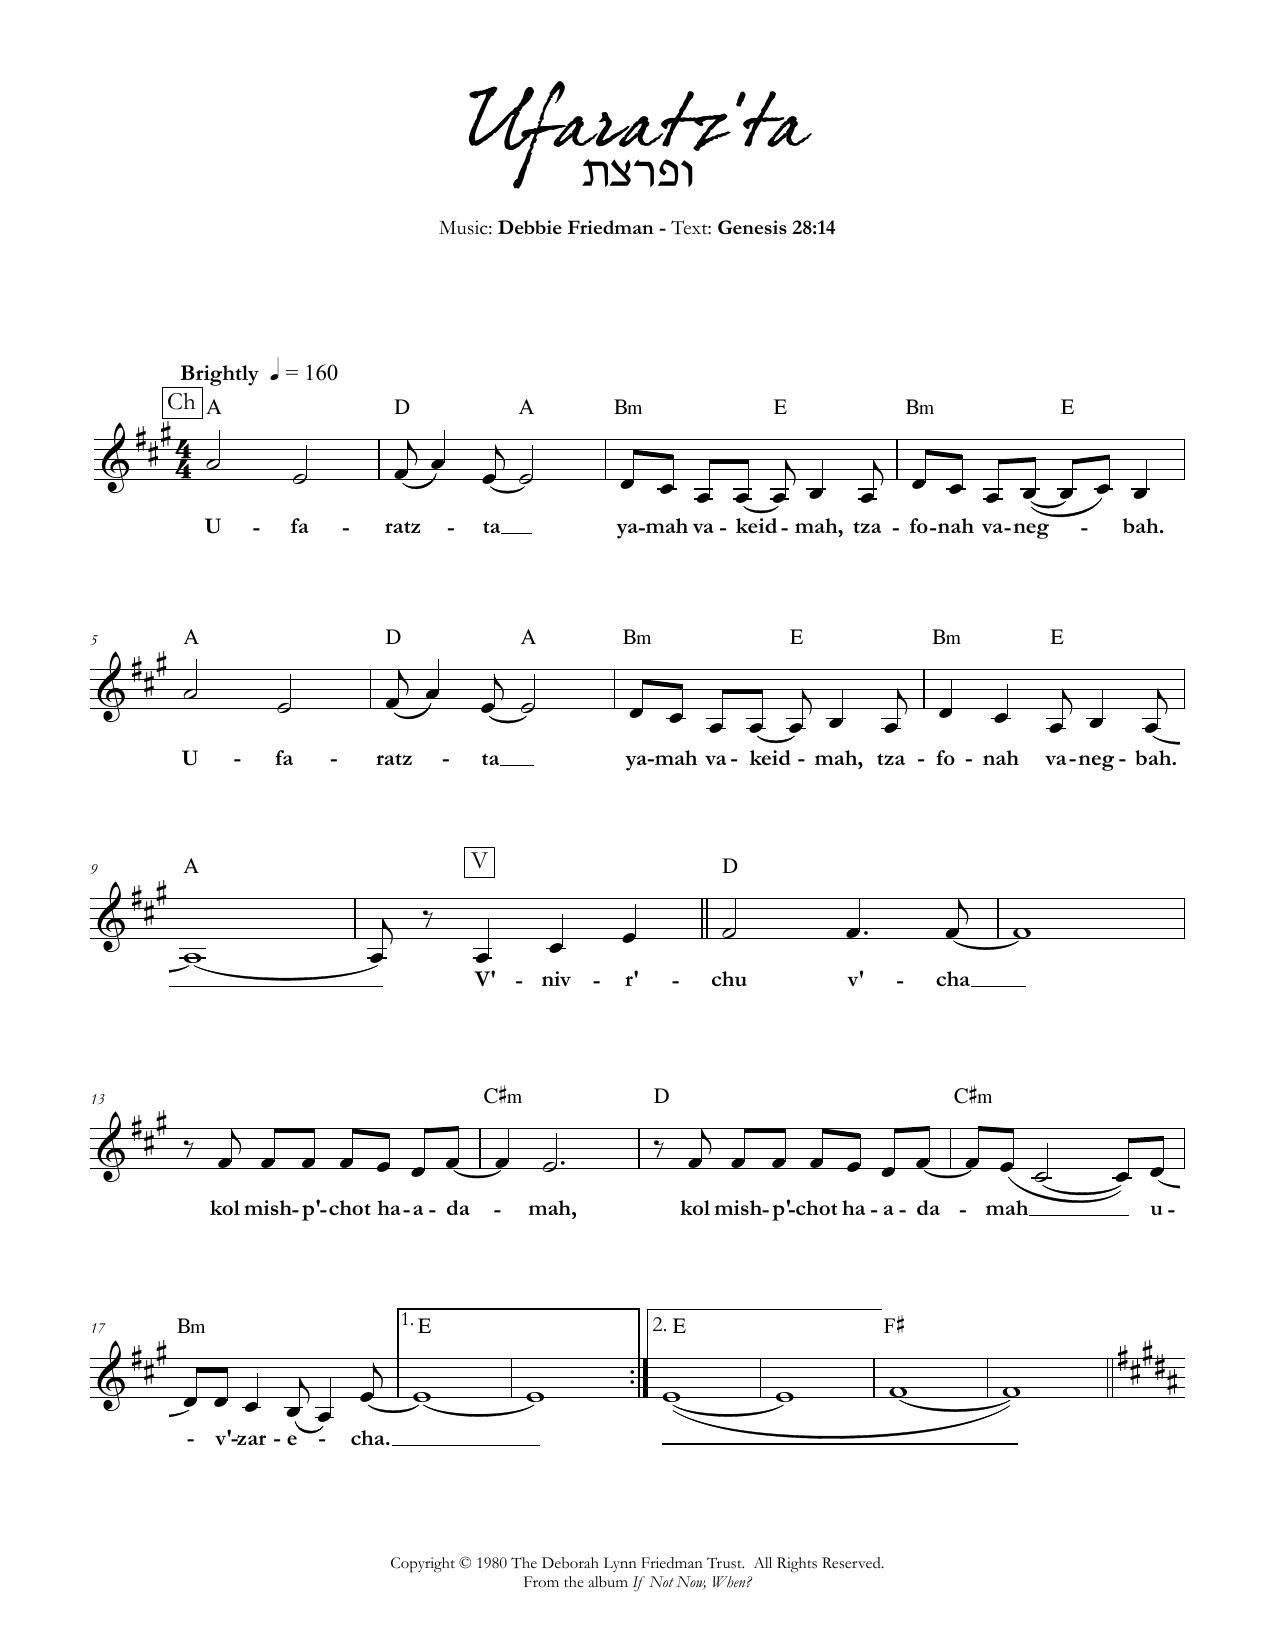 Ufaratz'ta Sheet Music